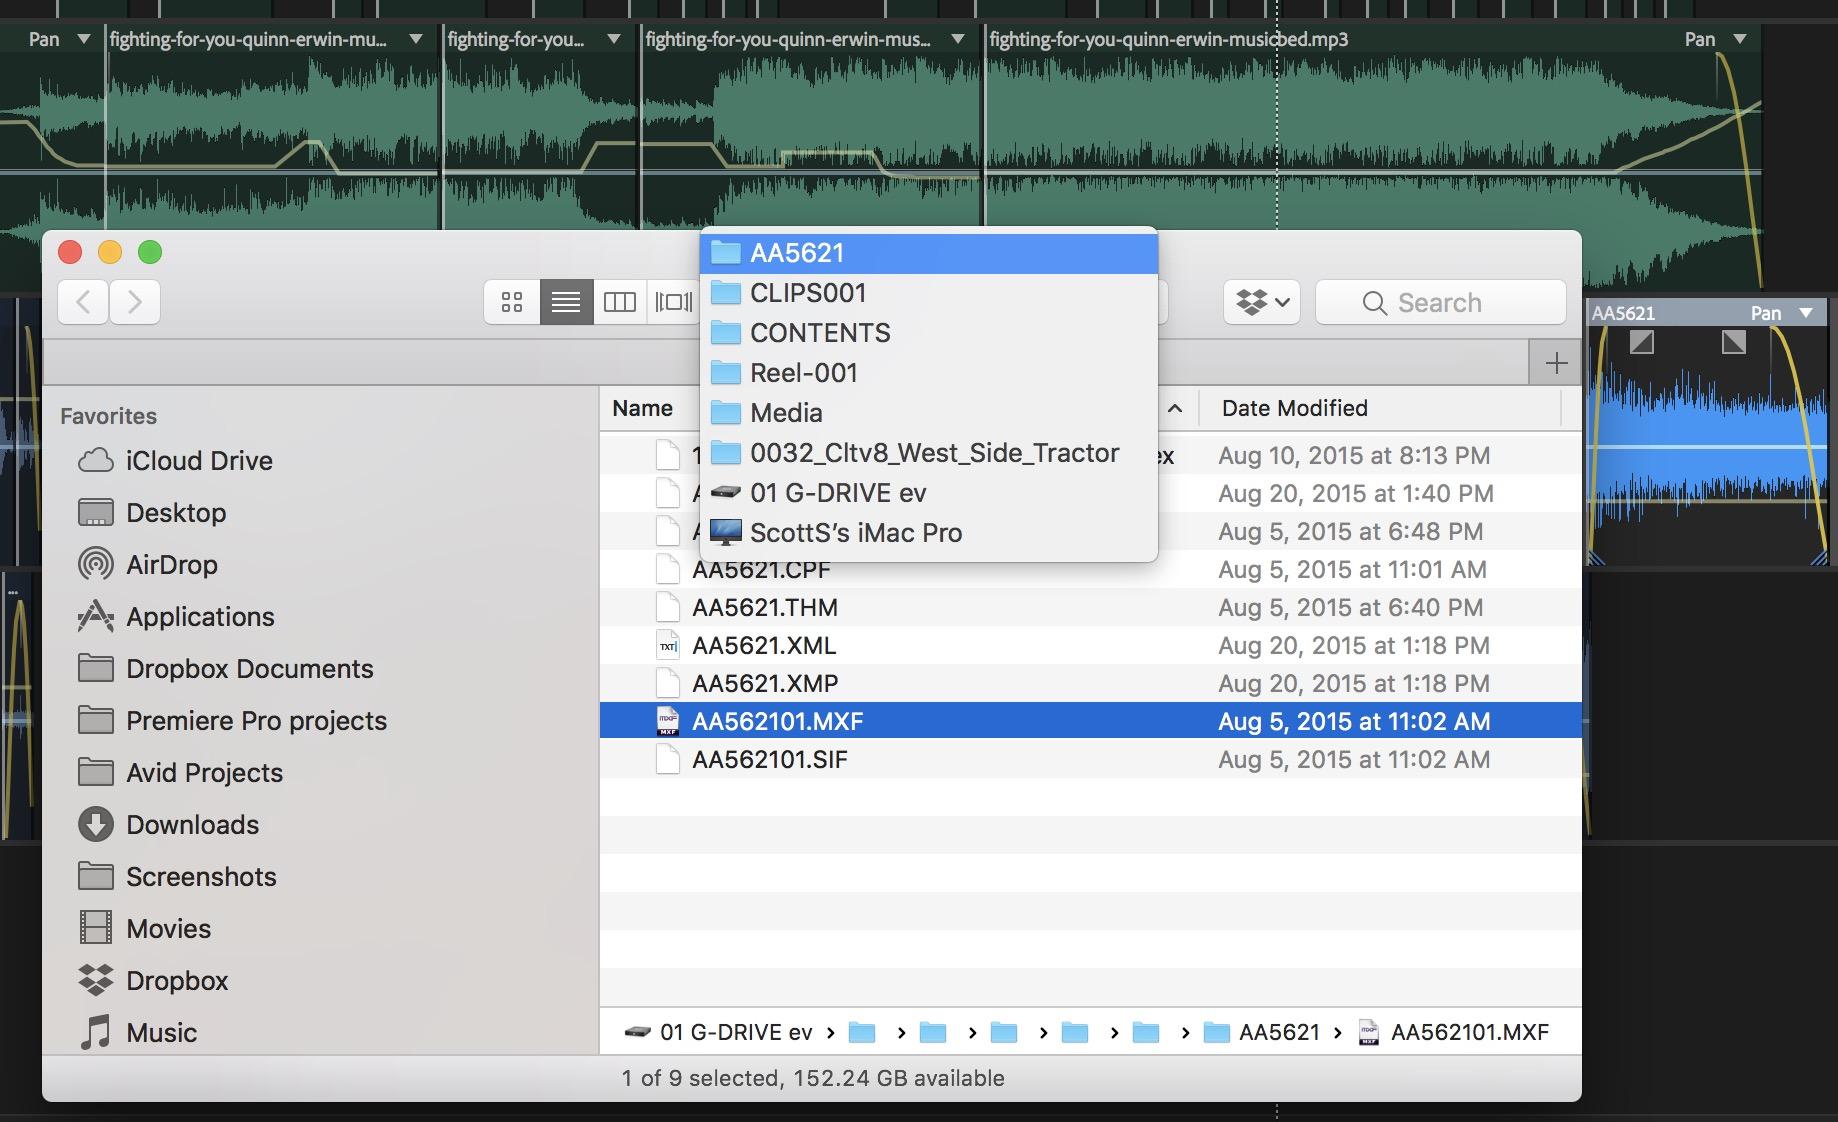 Adobe Premiere Pro Audition mxd files